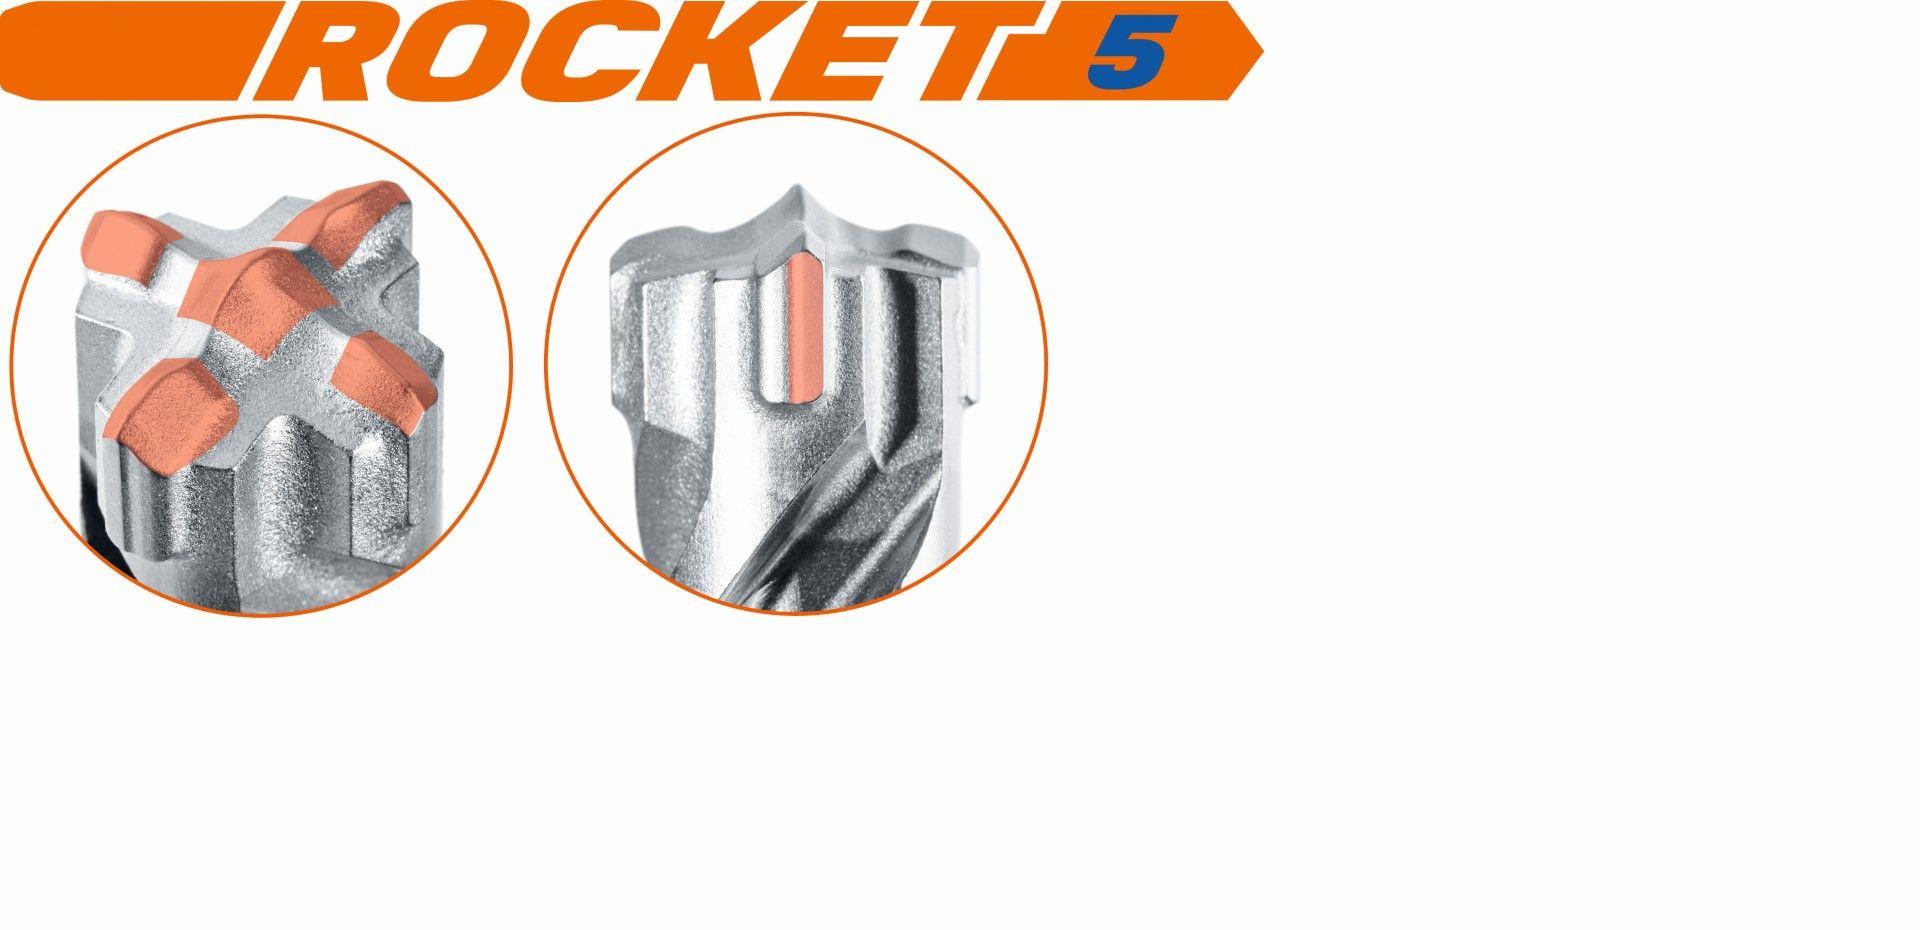 Slika BORER Rocket 5 SDS-plus 6x210 mm 4 kraka